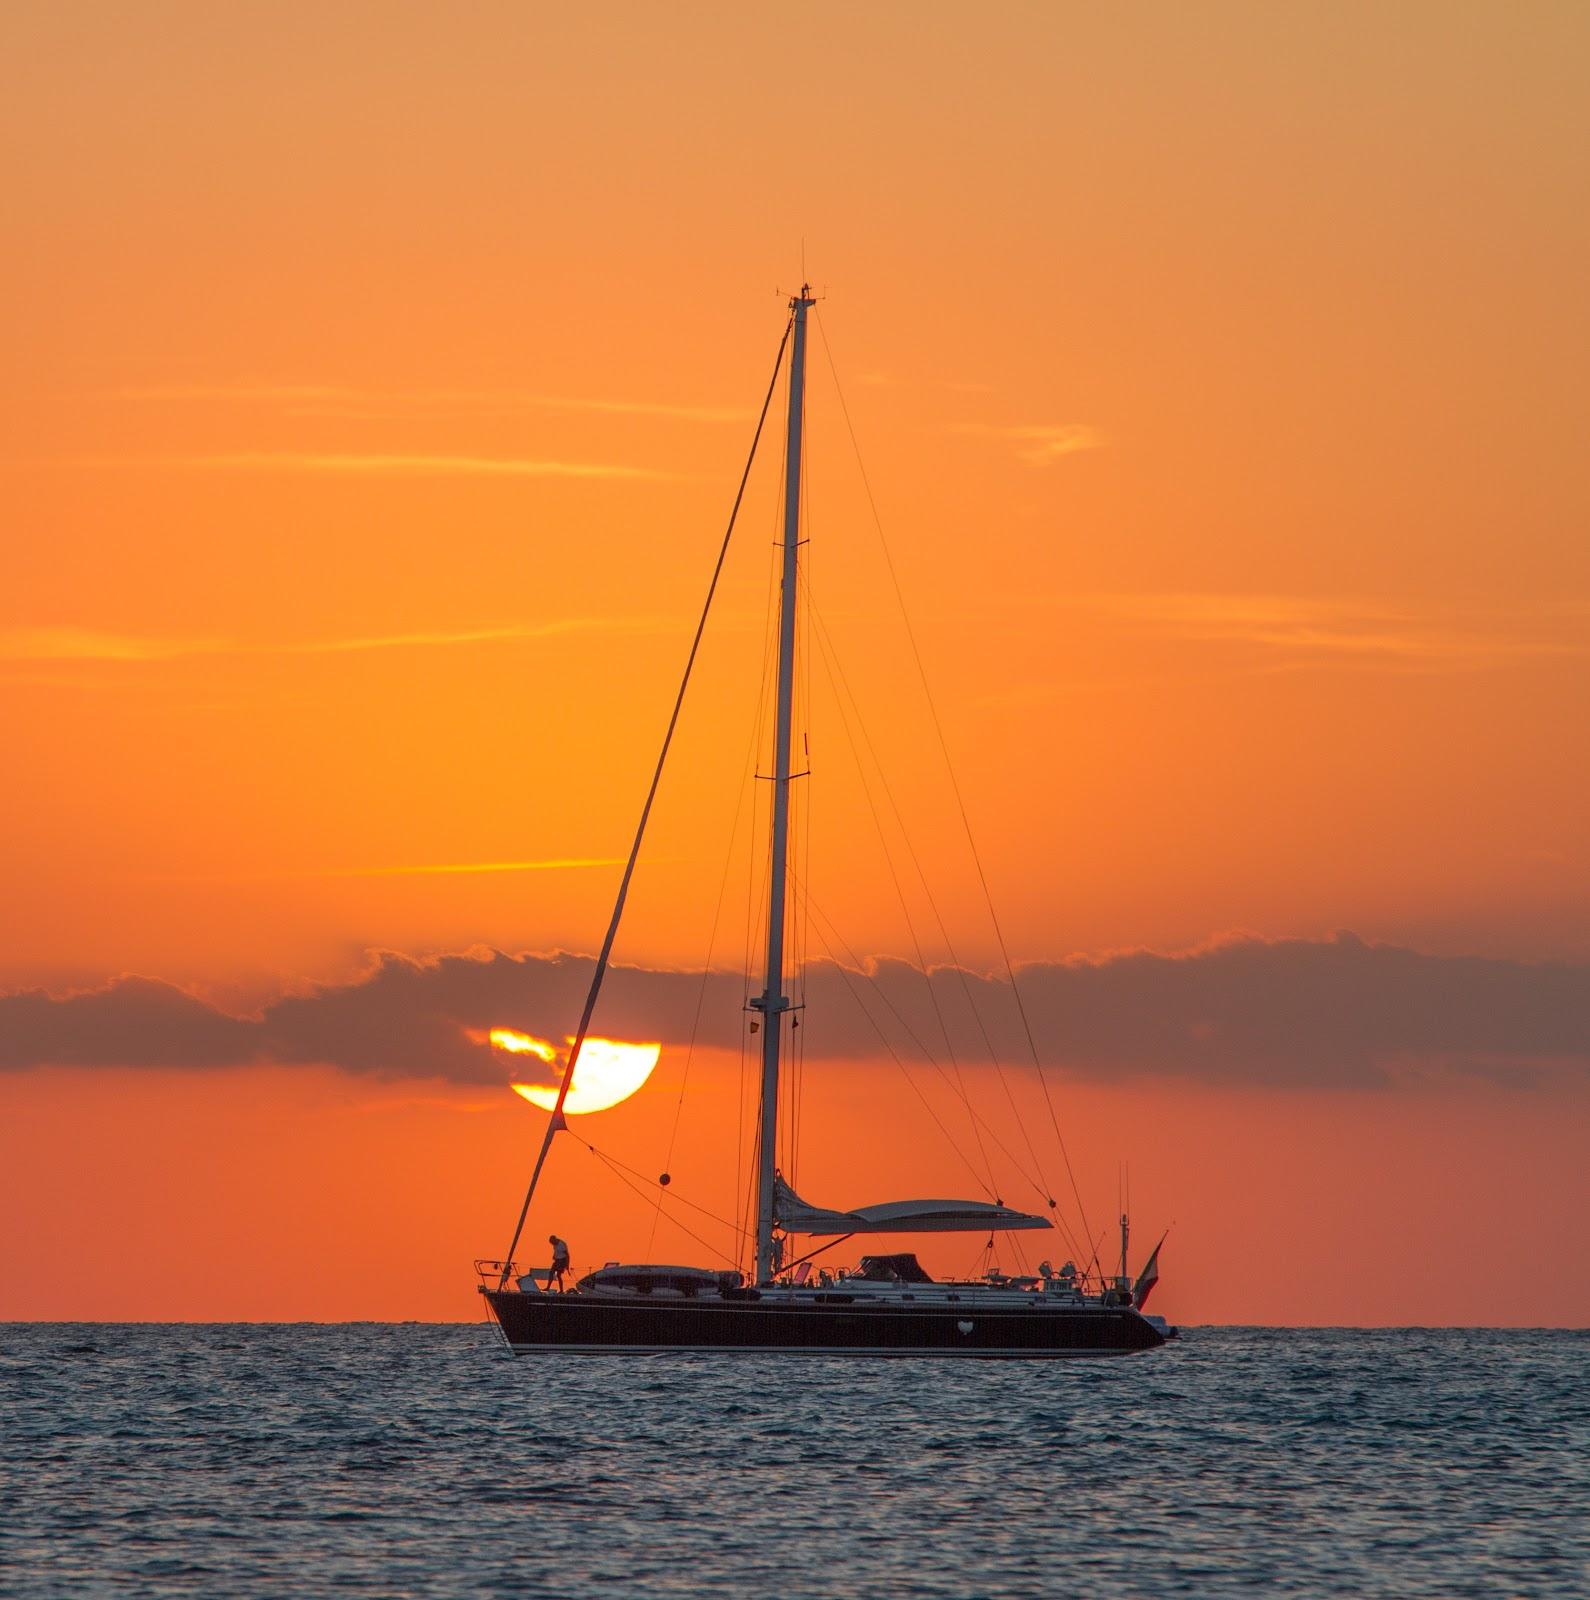 sunrise and sailboat